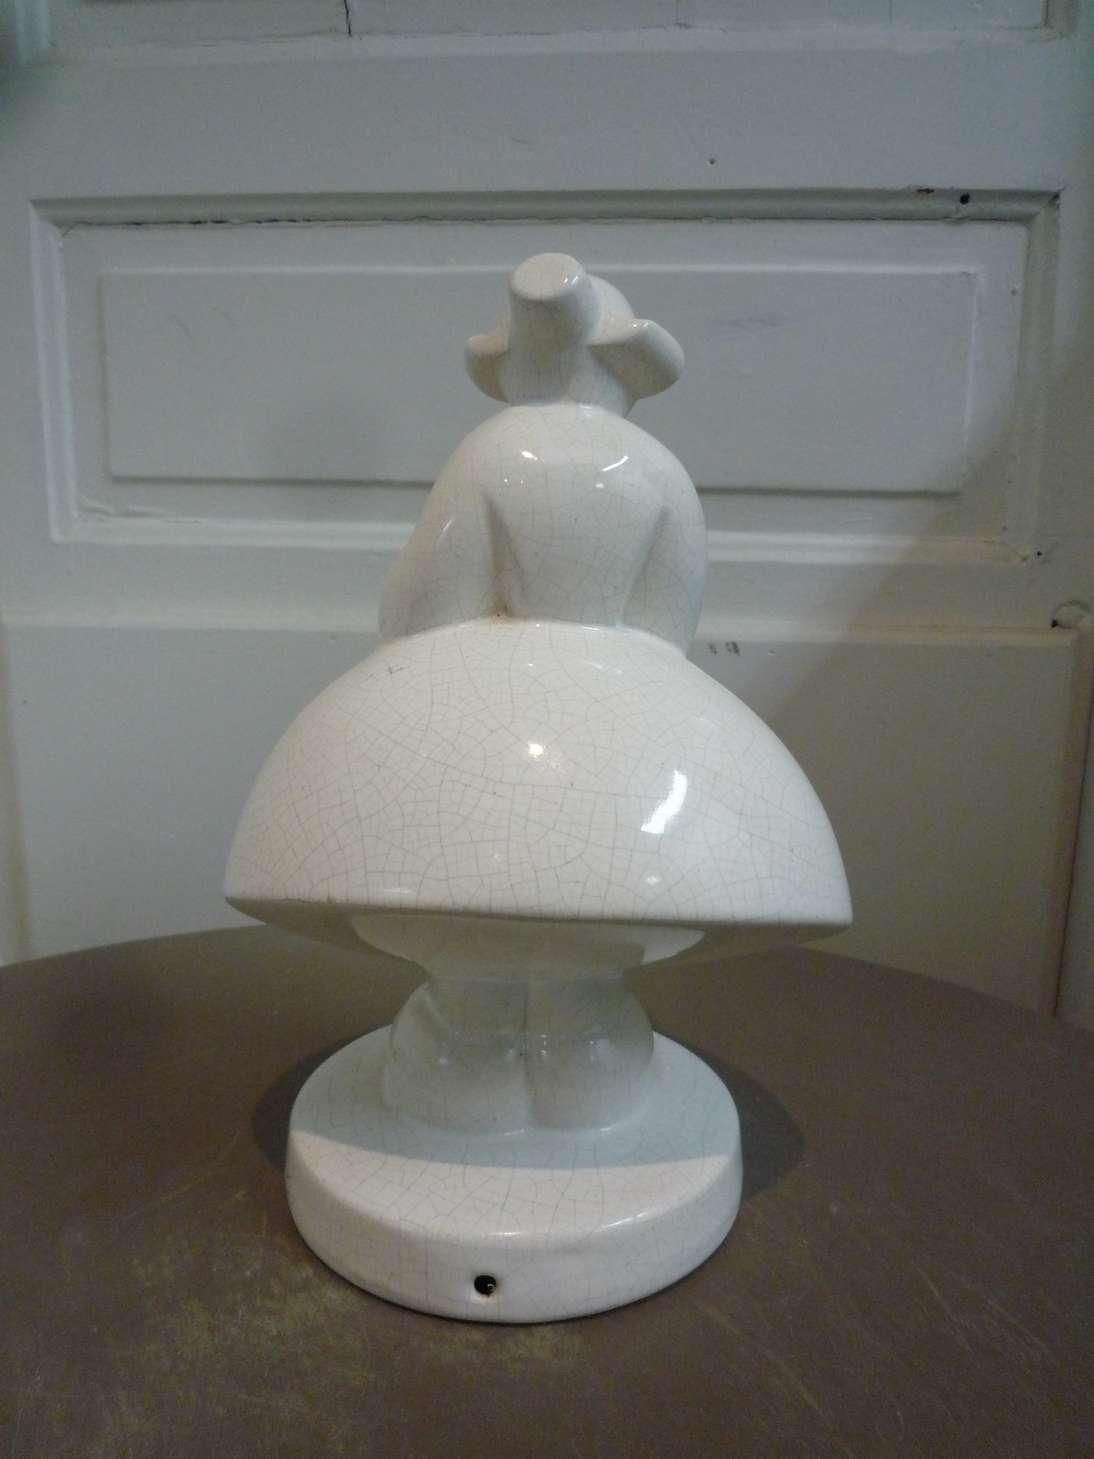 faience-email-robj-lampe-becassine-craquele-craquelures-art-1926-ateliers-restaurarte-restauration-pinchon-ceramique.jpg